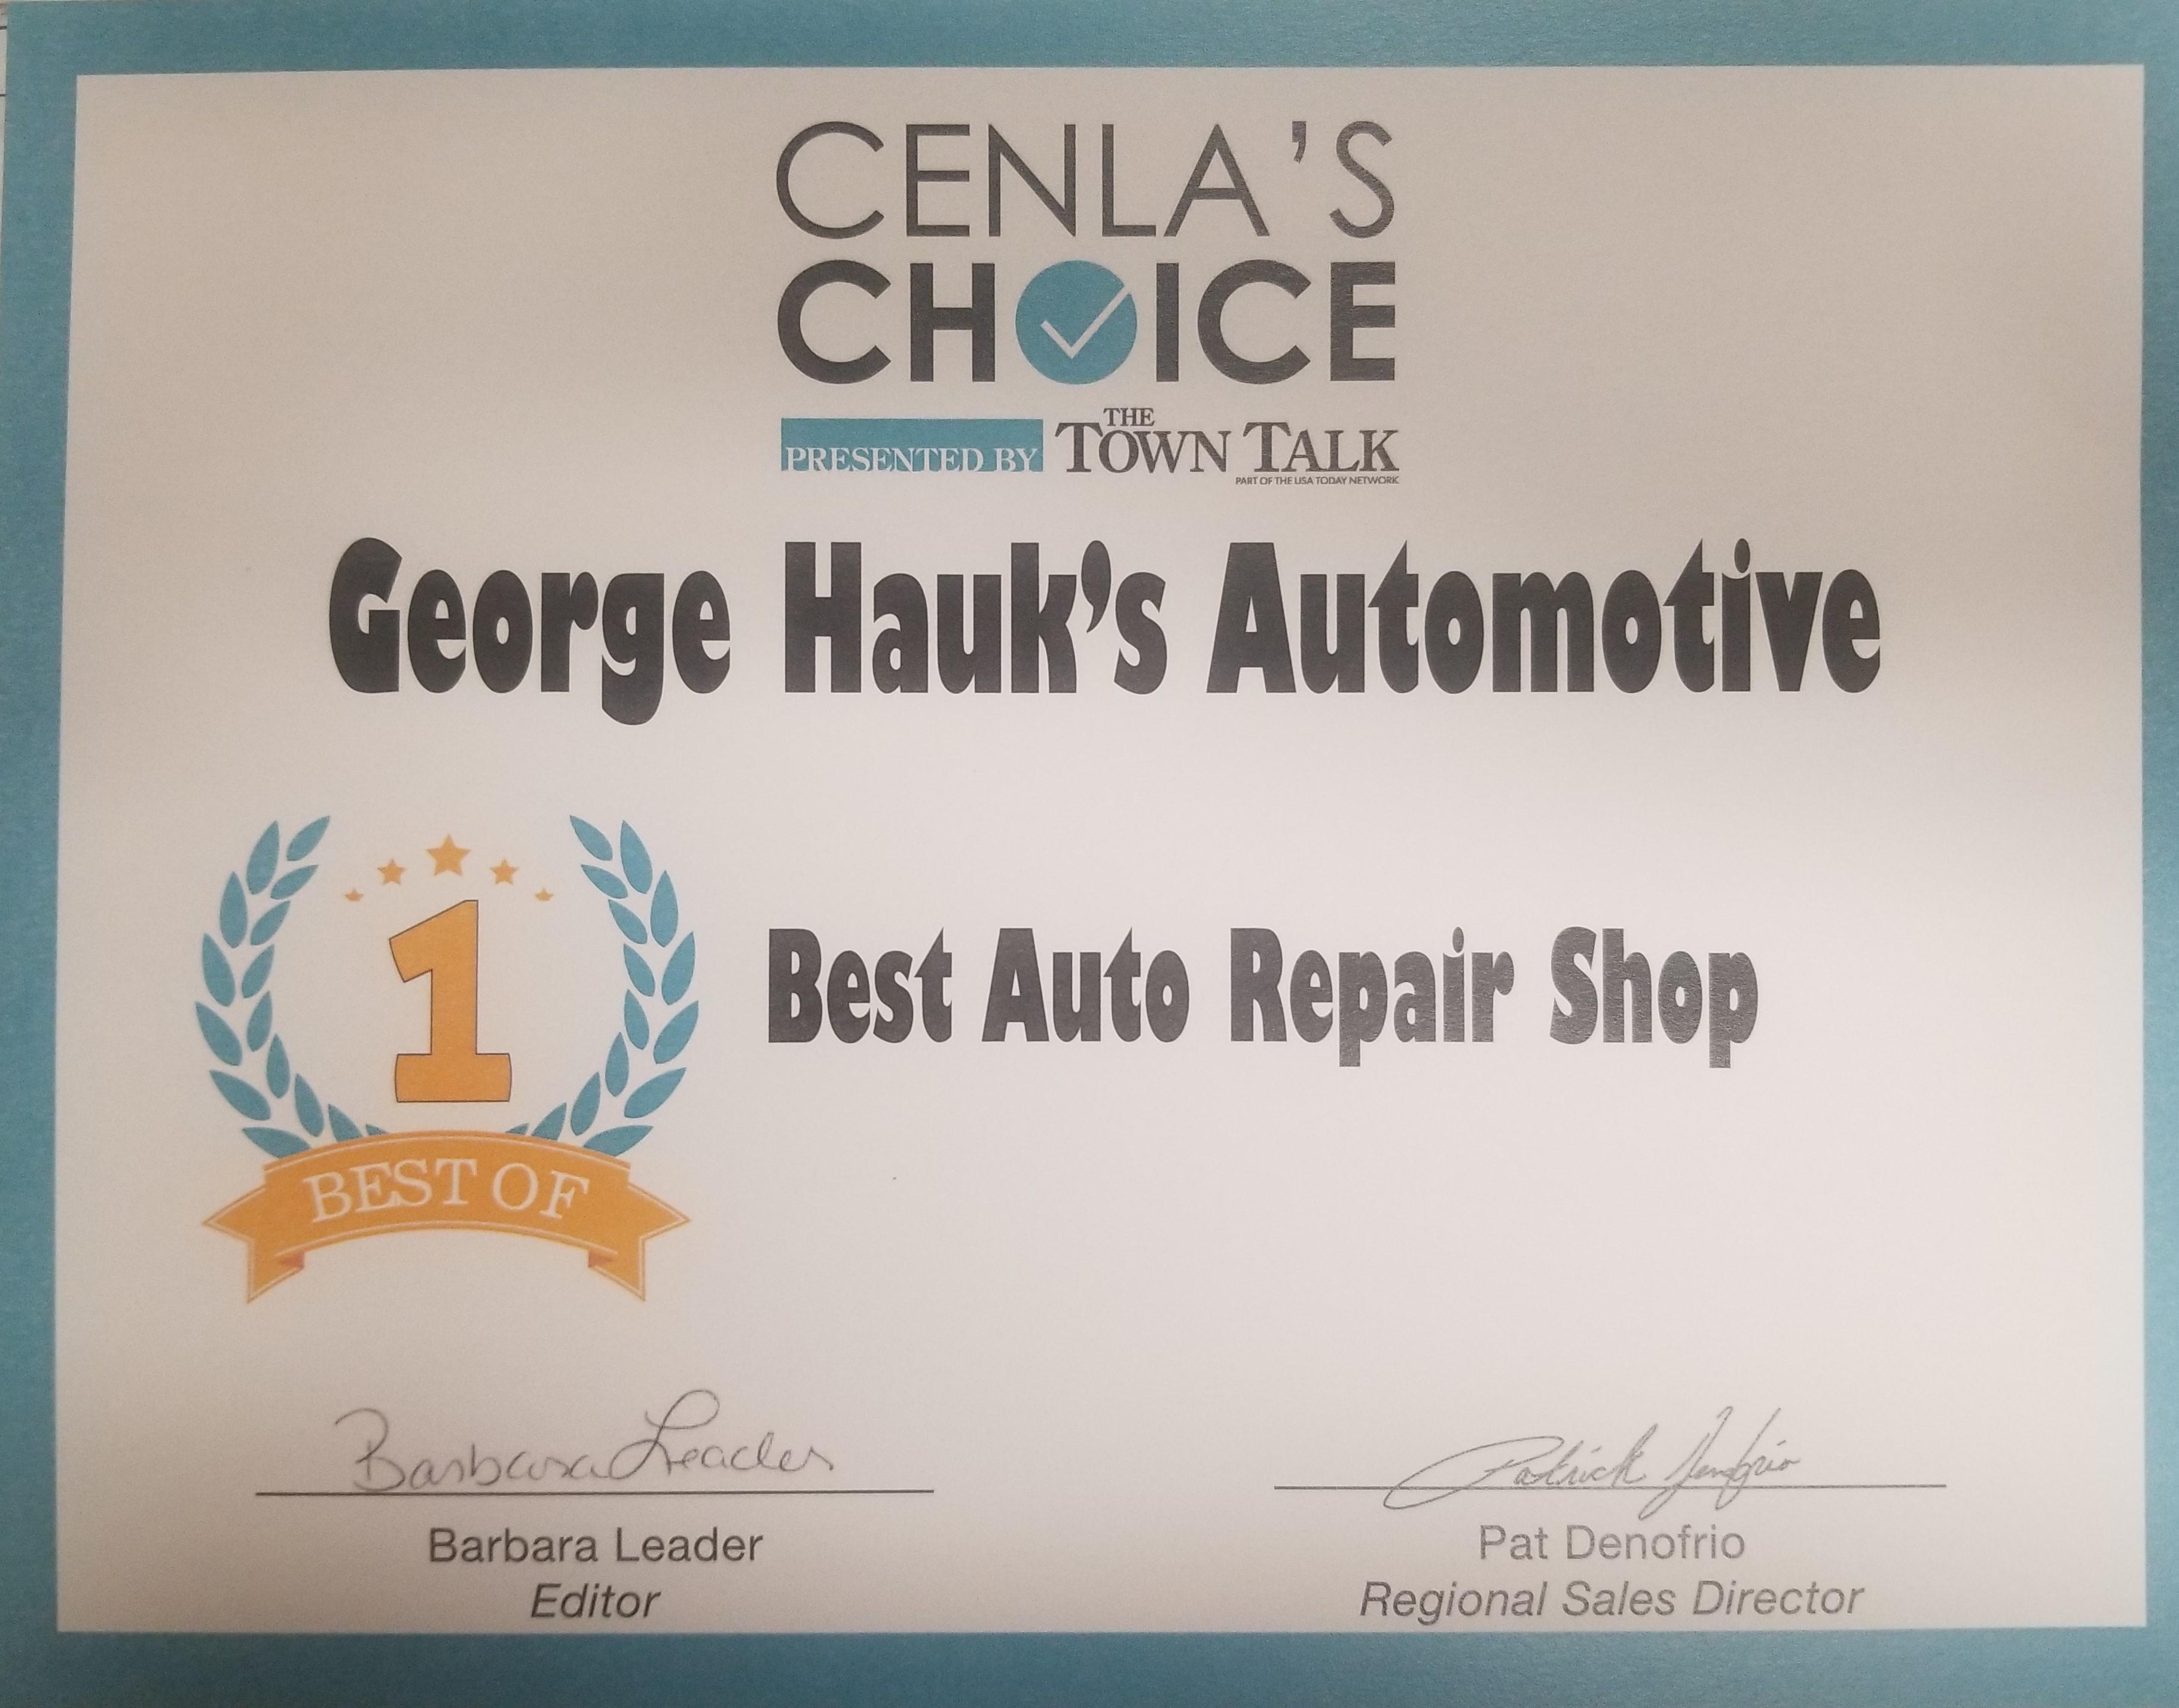 George Hauk's Automotive reviews   Auto Repair at 3204 Industrial Dr. - Alexandria LA